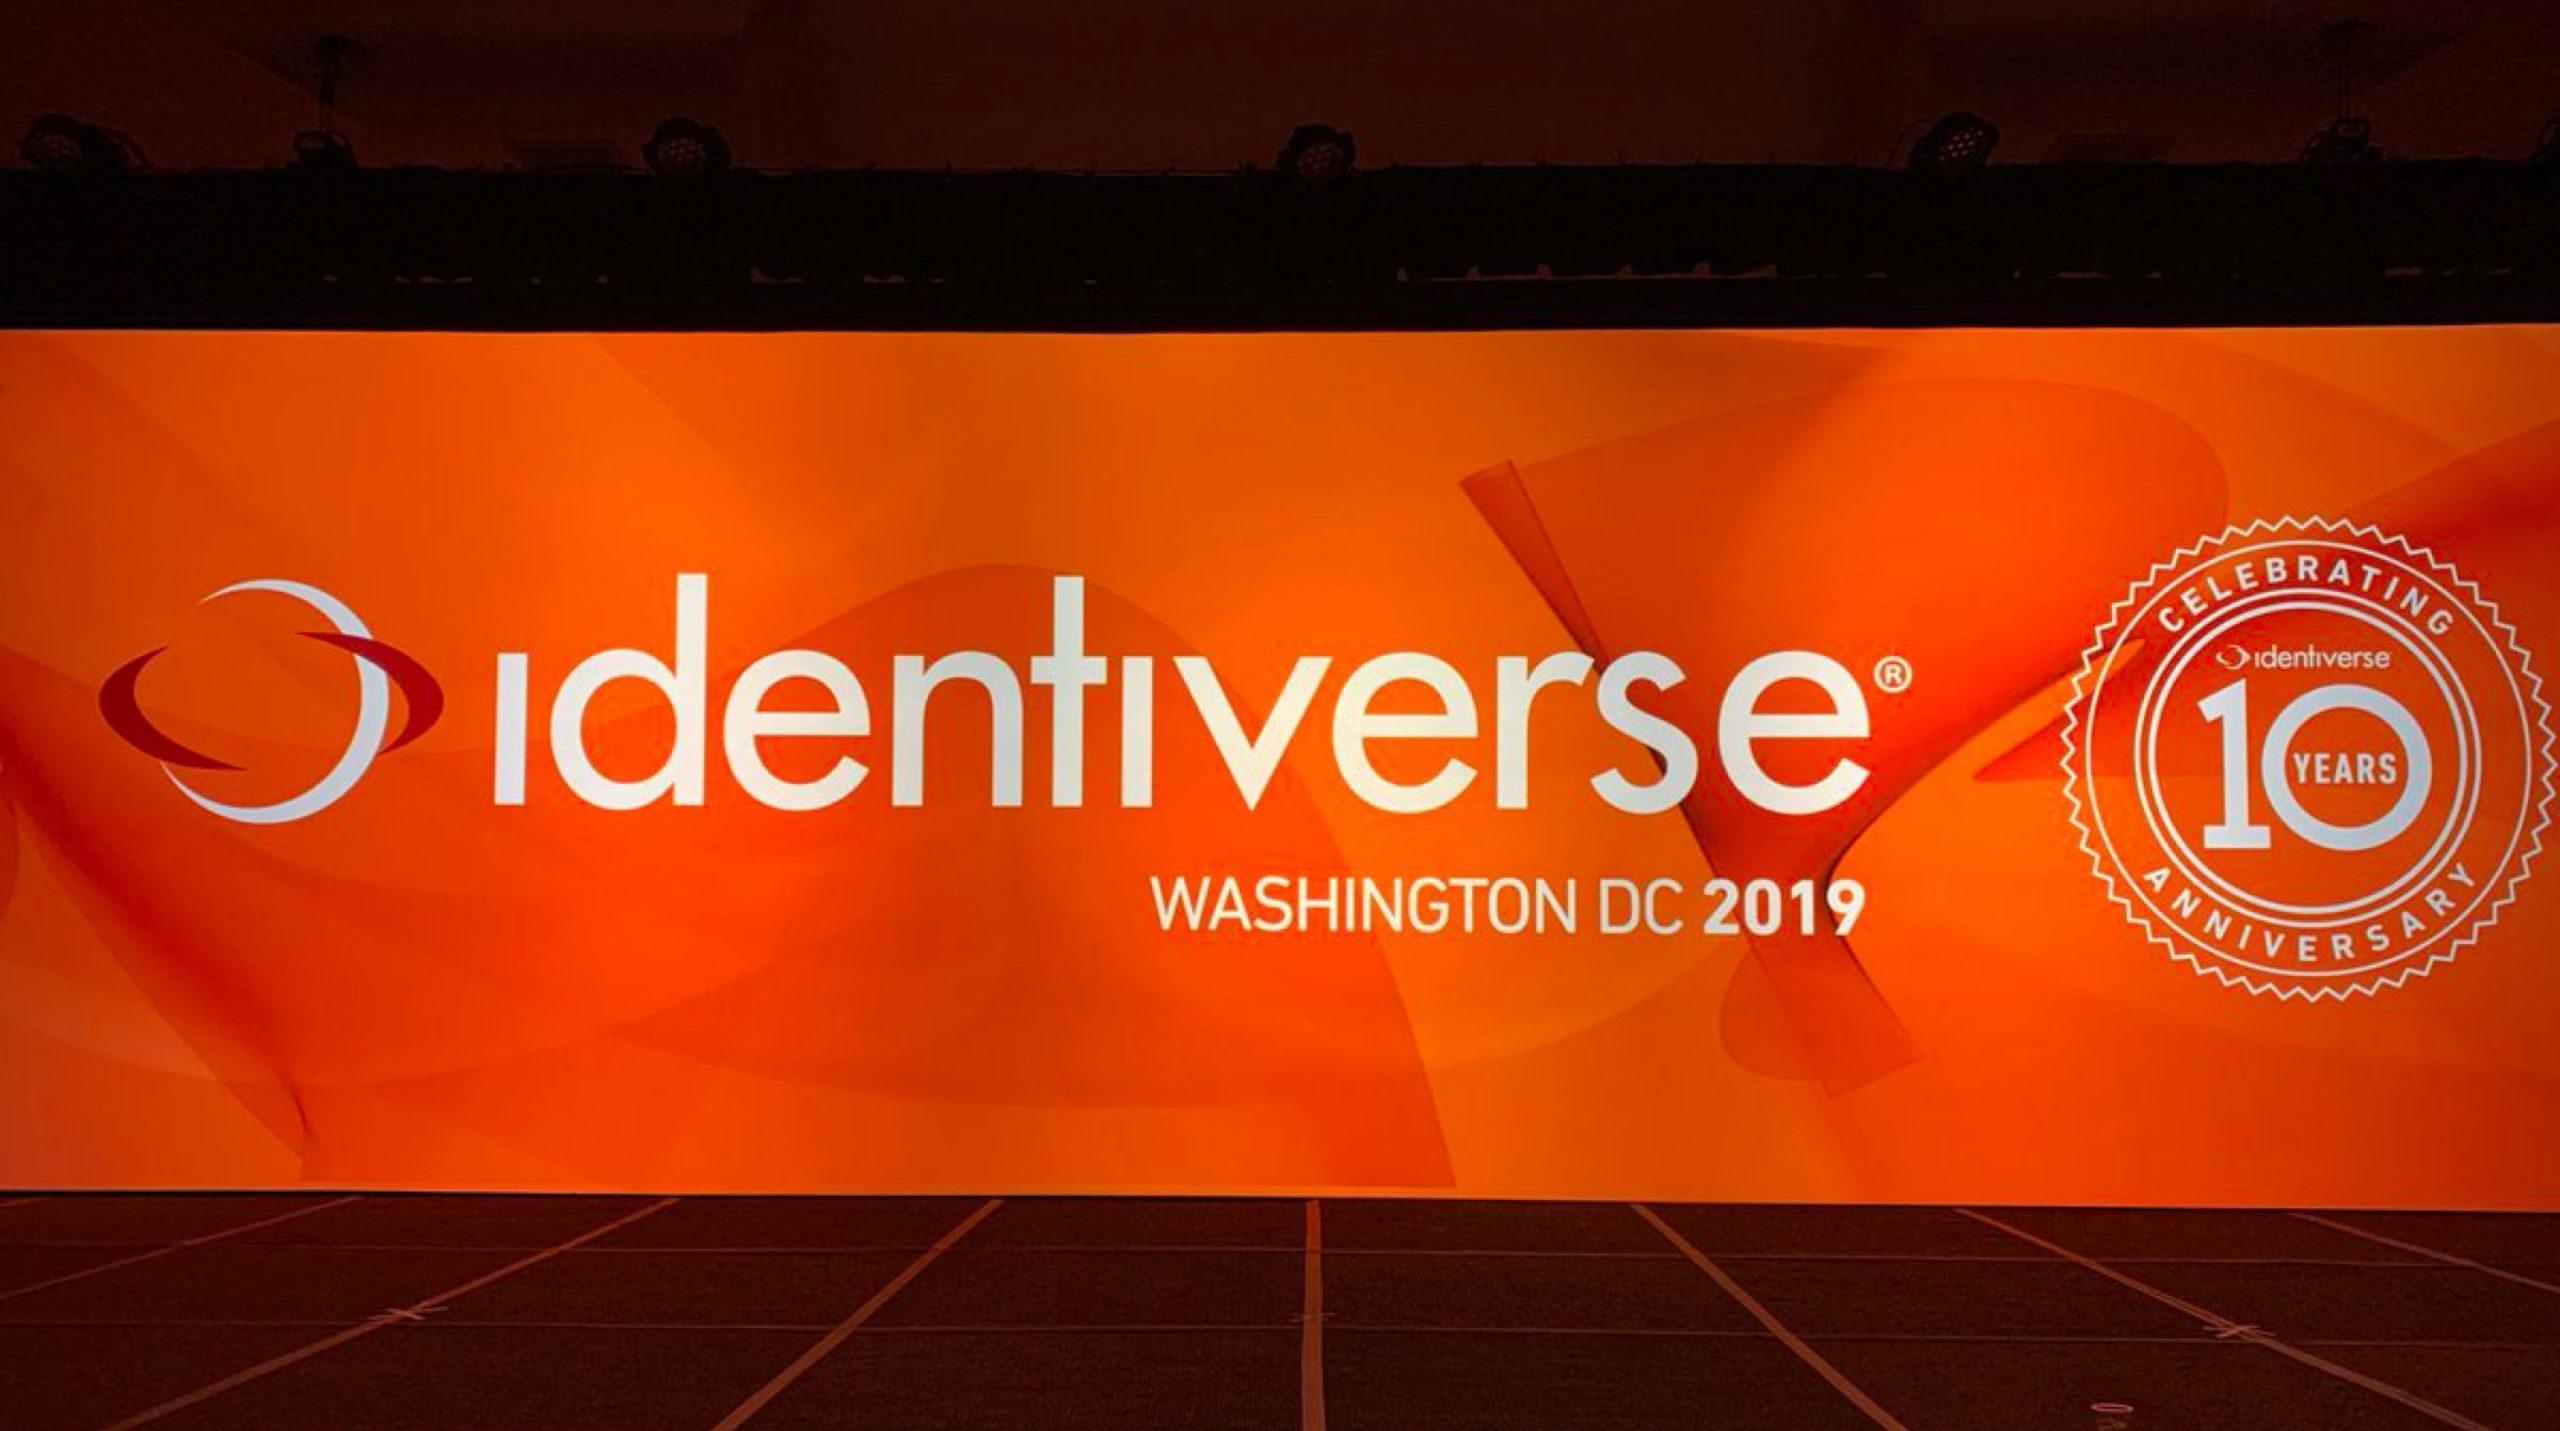 blog-banner-5-Key-Takeaways-from-Identiverse-2019